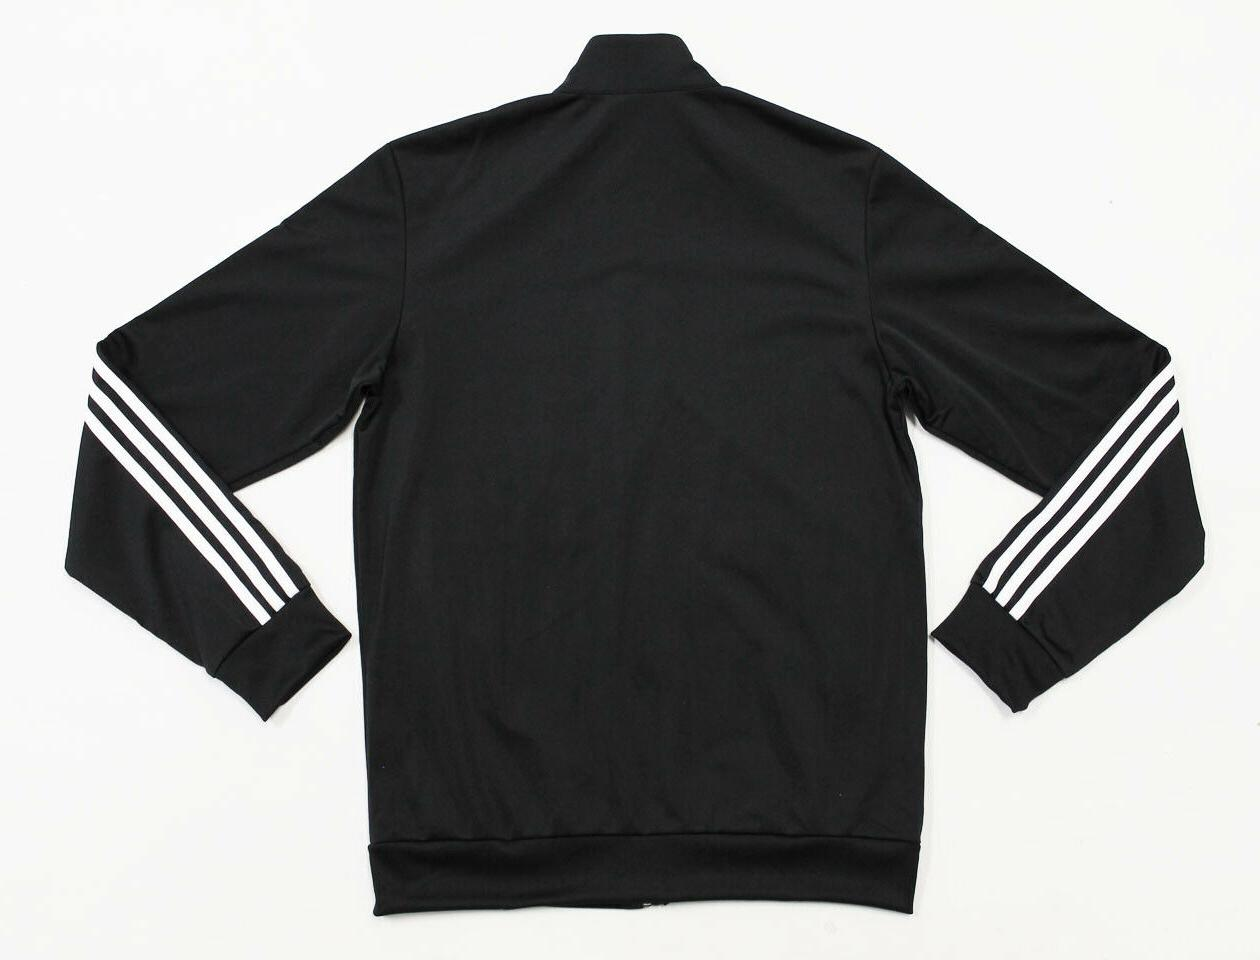 NWT Black-White Pocket-Zipper Track Suit Set Jacket Pants